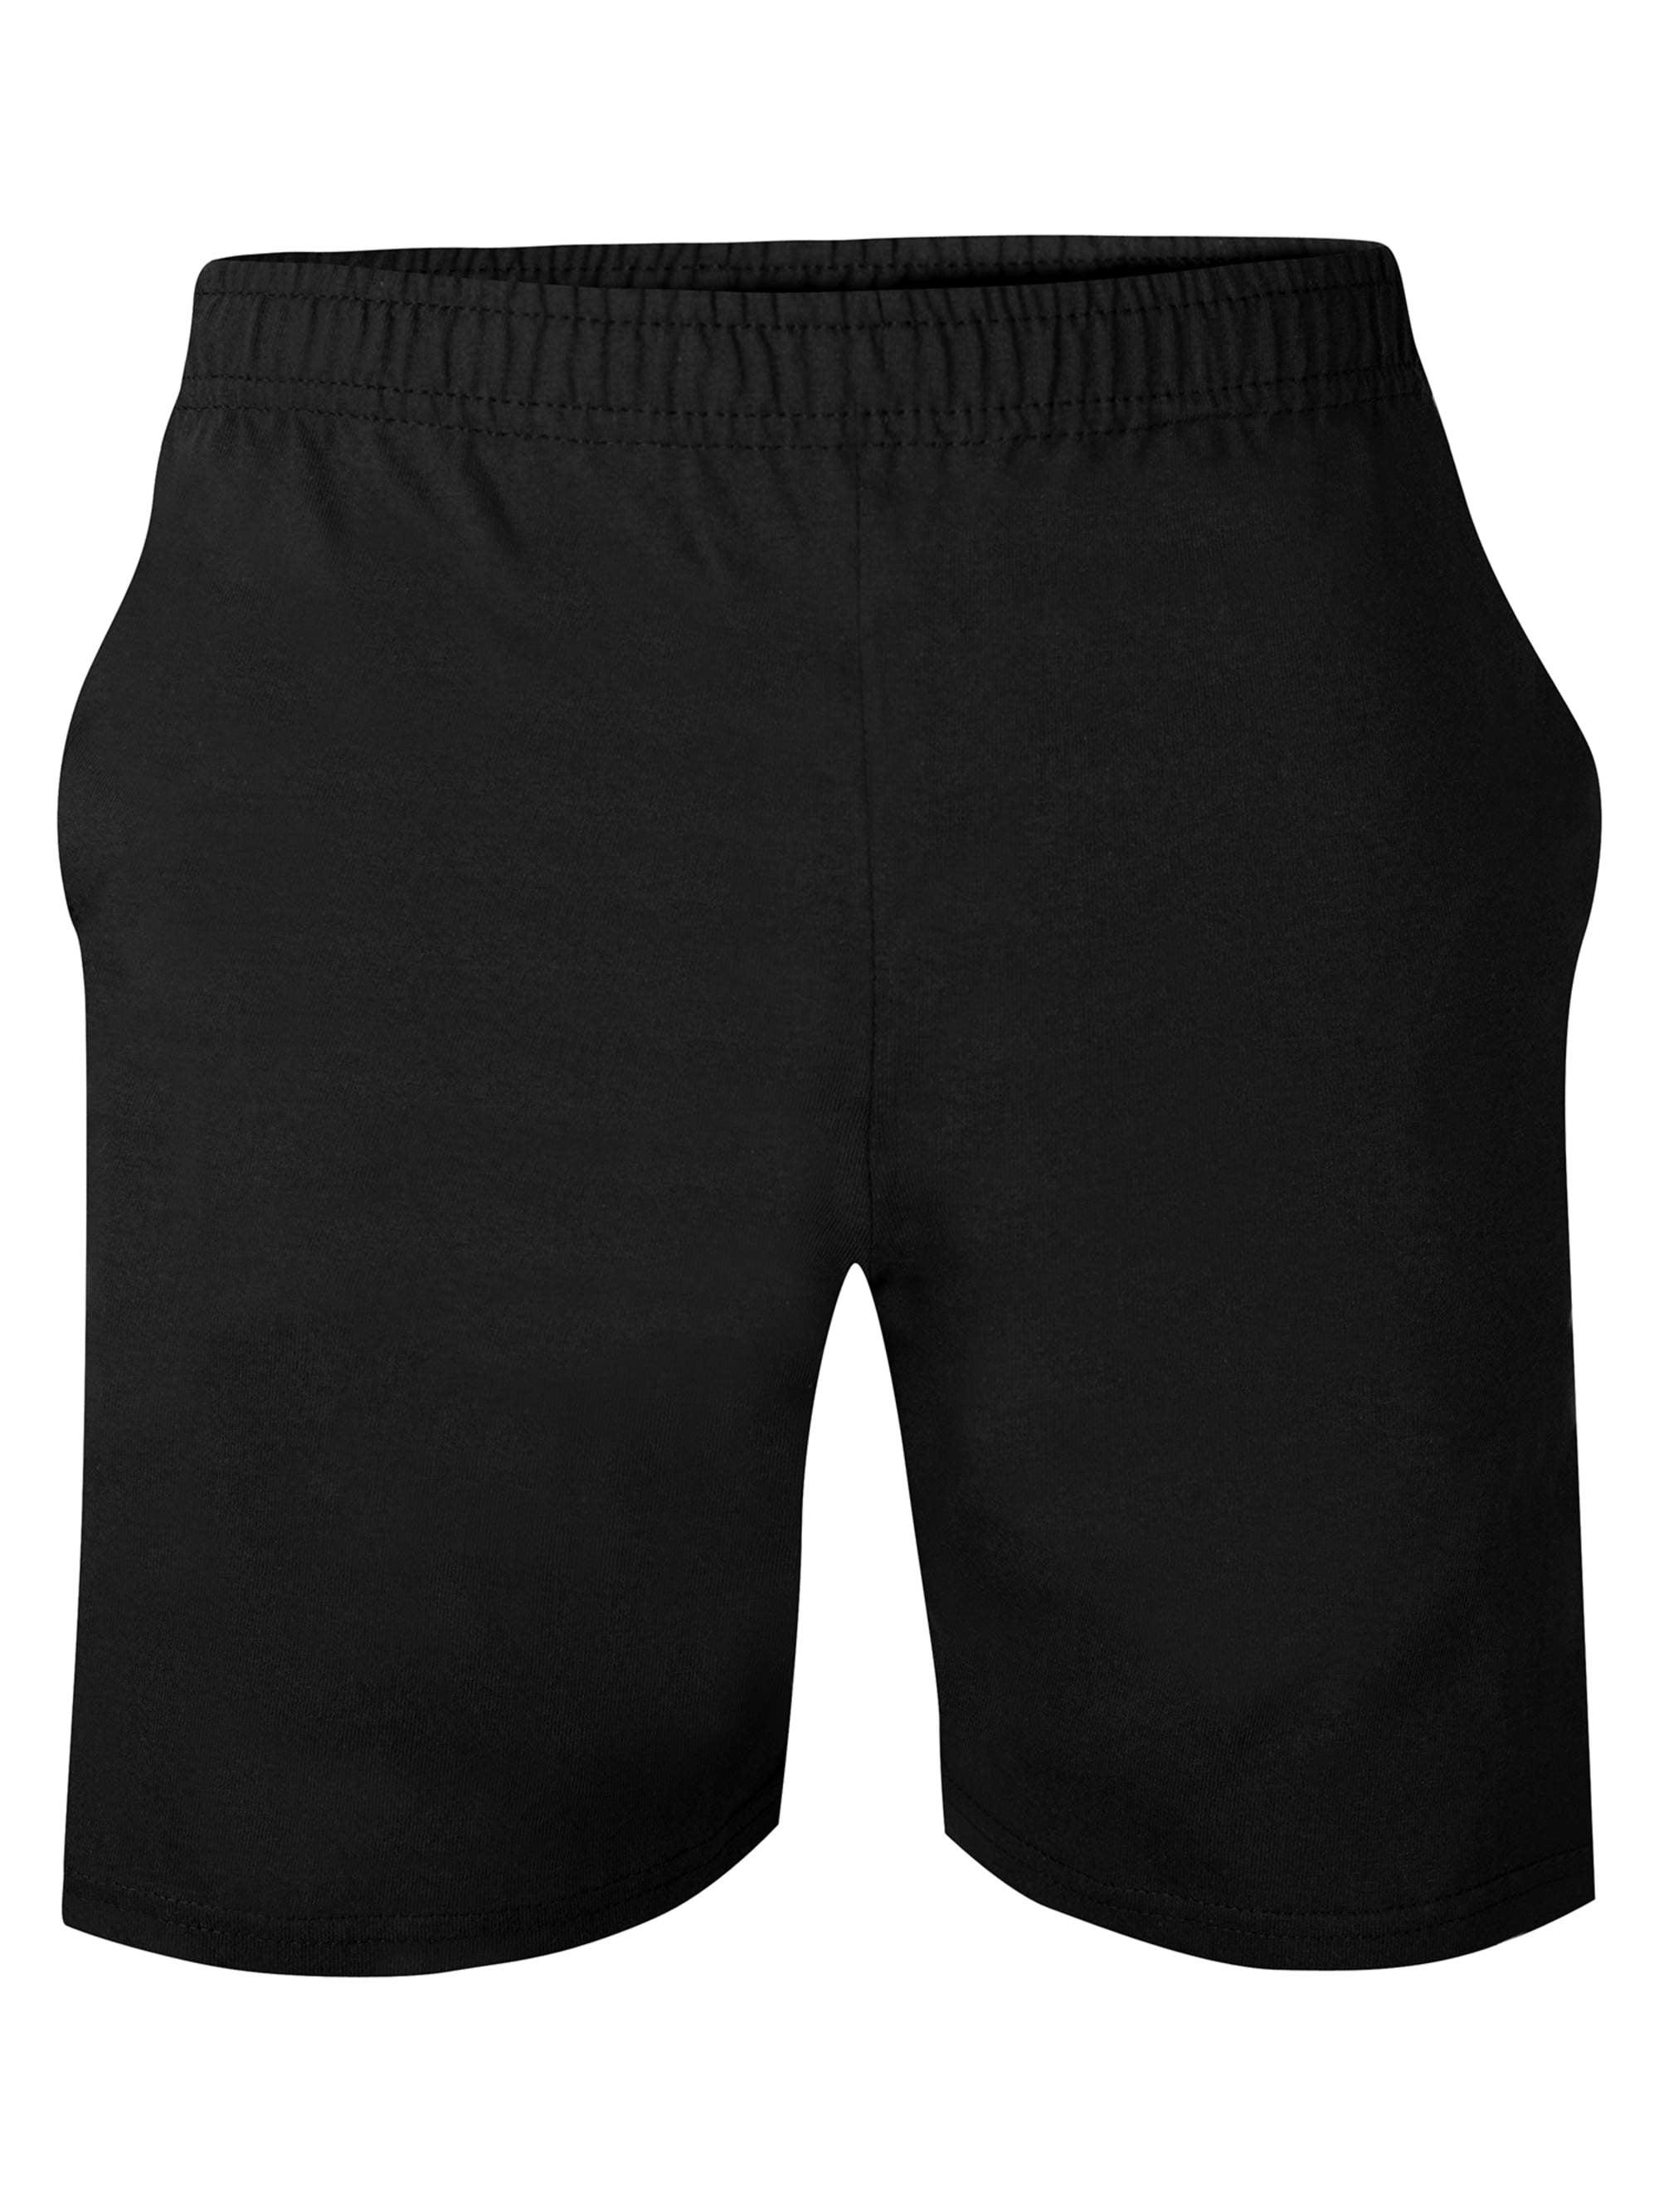 Boys Jersey Pocket Shorts